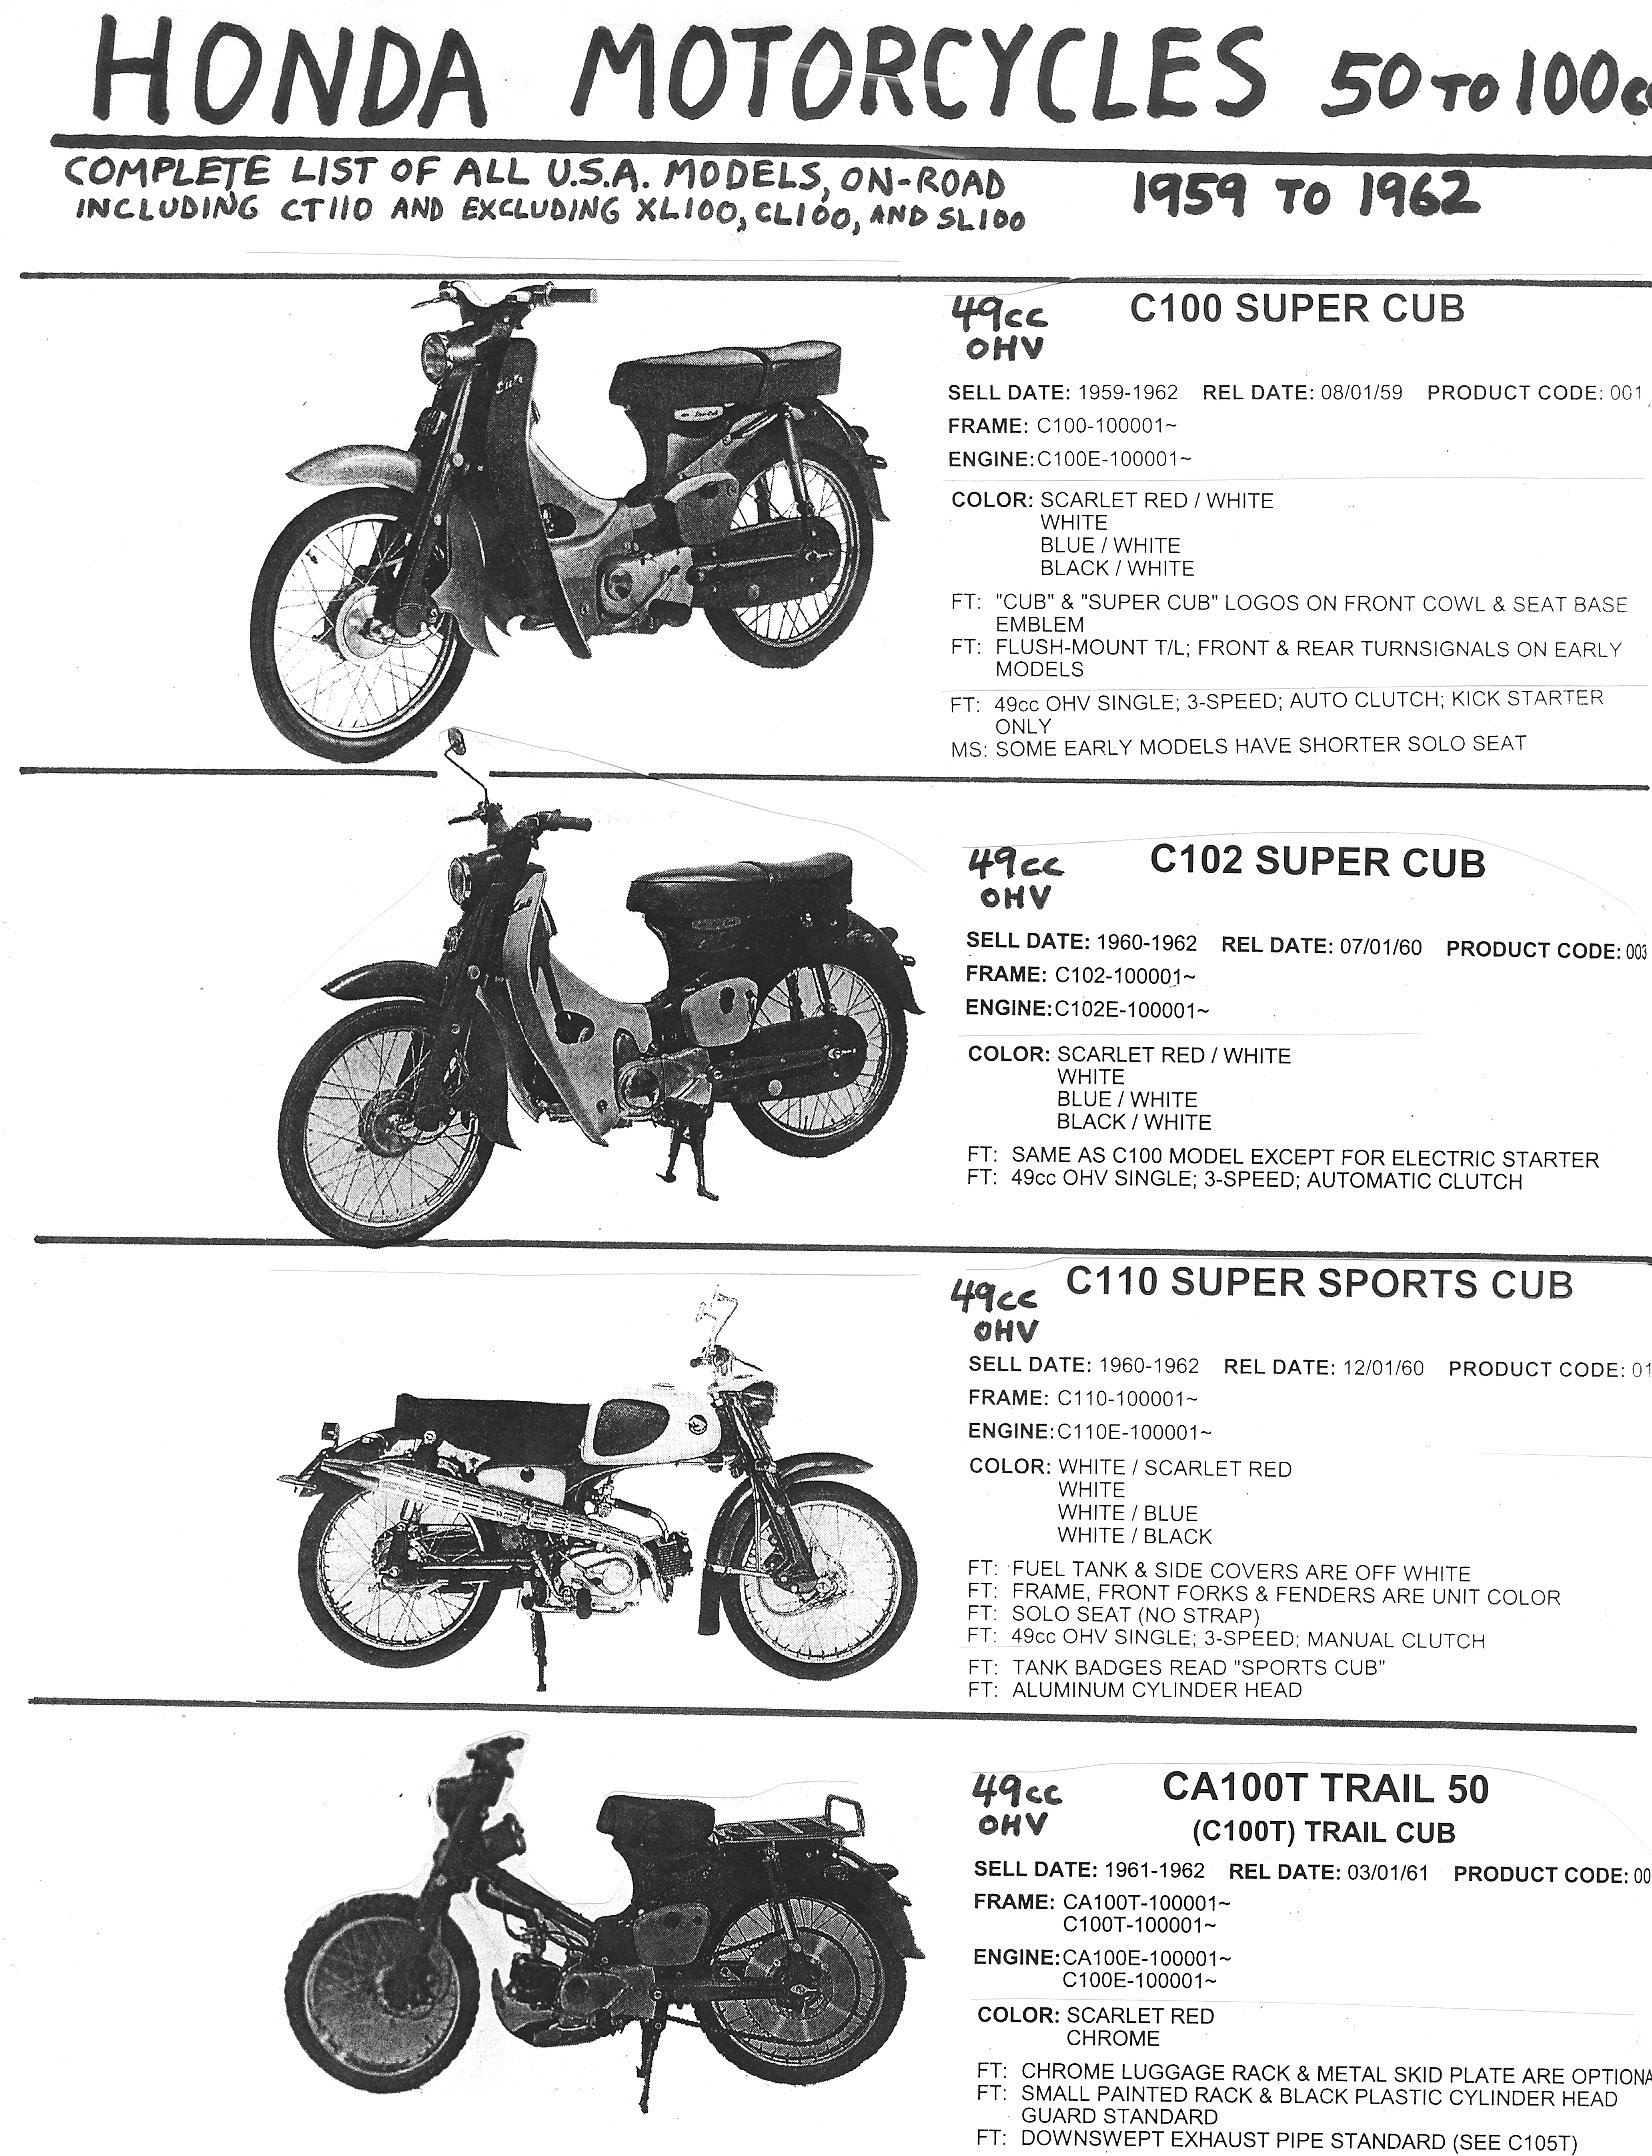 1970s Honda Cub Wiring Diagram 1965 Plymouth Belvedere Wiring Diagram For Wiring Diagram Schematics